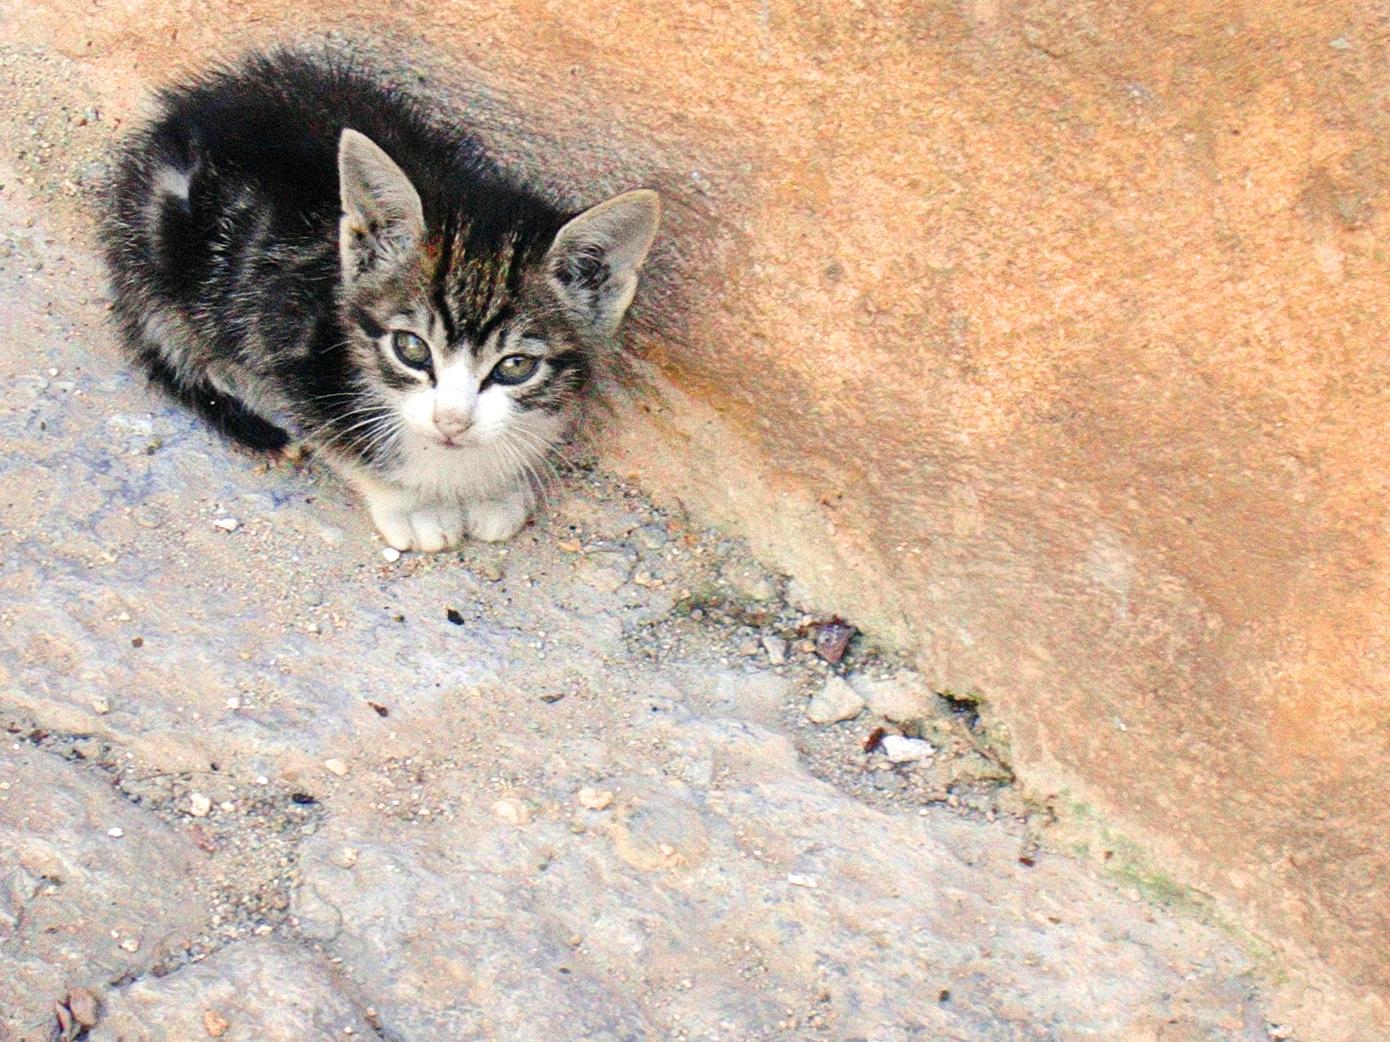 Small Kitten, Cat, Cute, Kitten, Little, HQ Photo